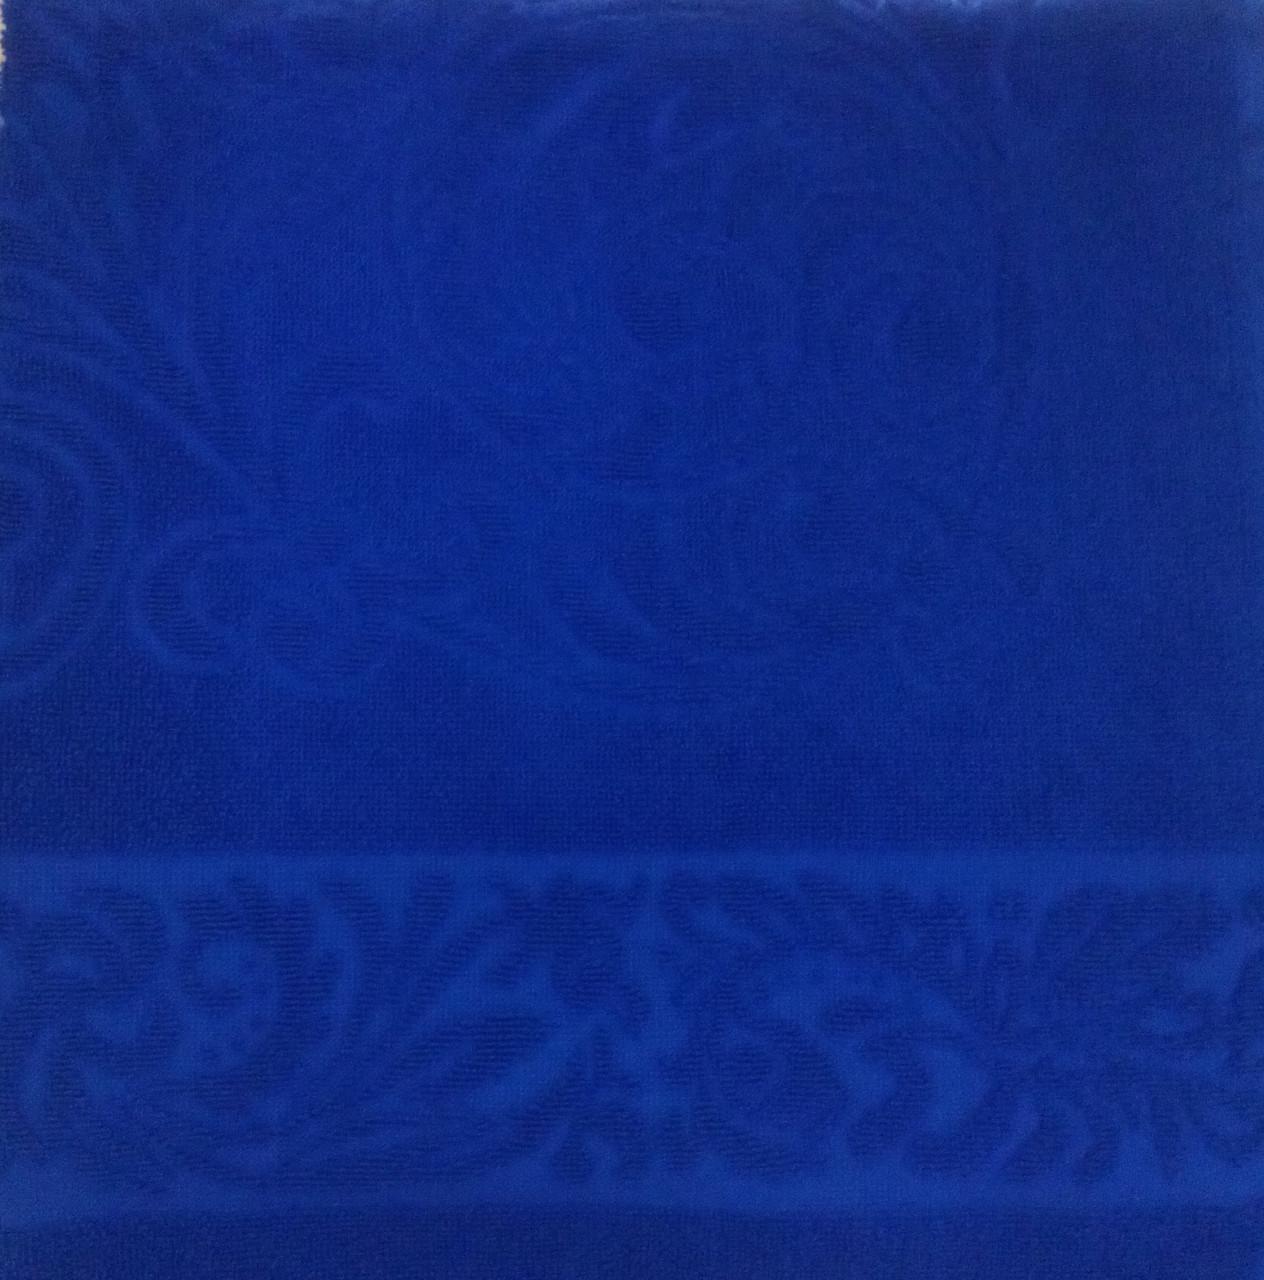 Полотенце махровое 67*150 ЖУРАВИНКА синий 100% хлопка,  (шт.)